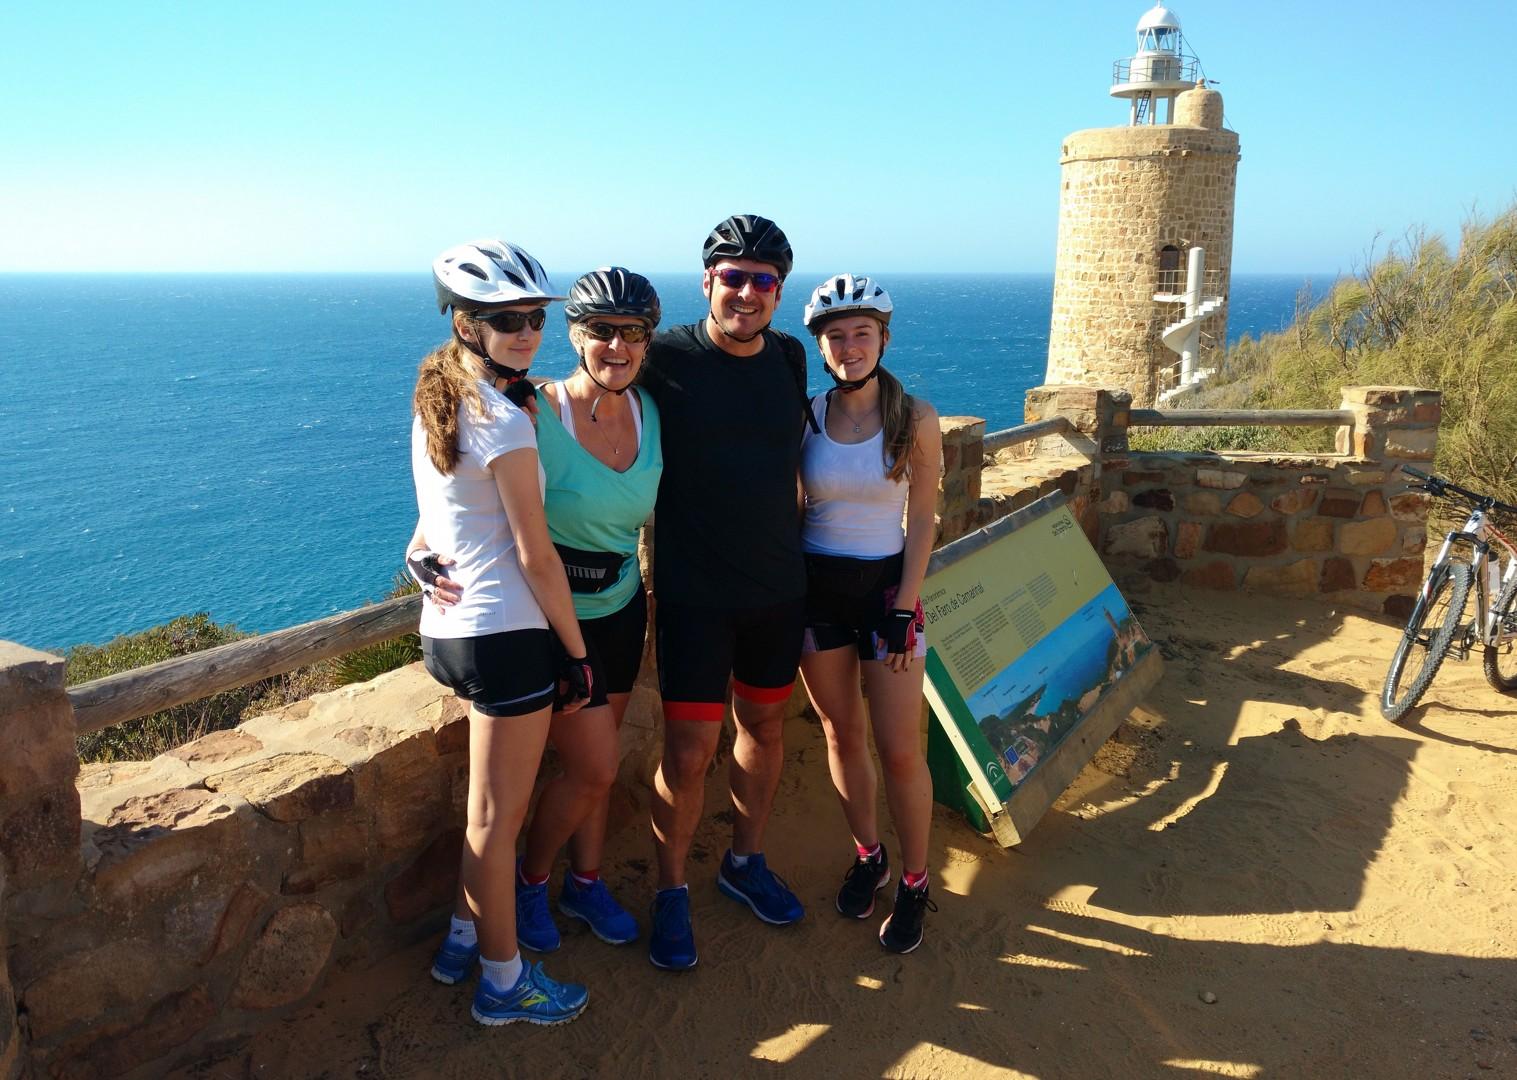 IMG_20171025_120722092.jpg - Southern Spain - Coastal Adventurer - Family Cycling